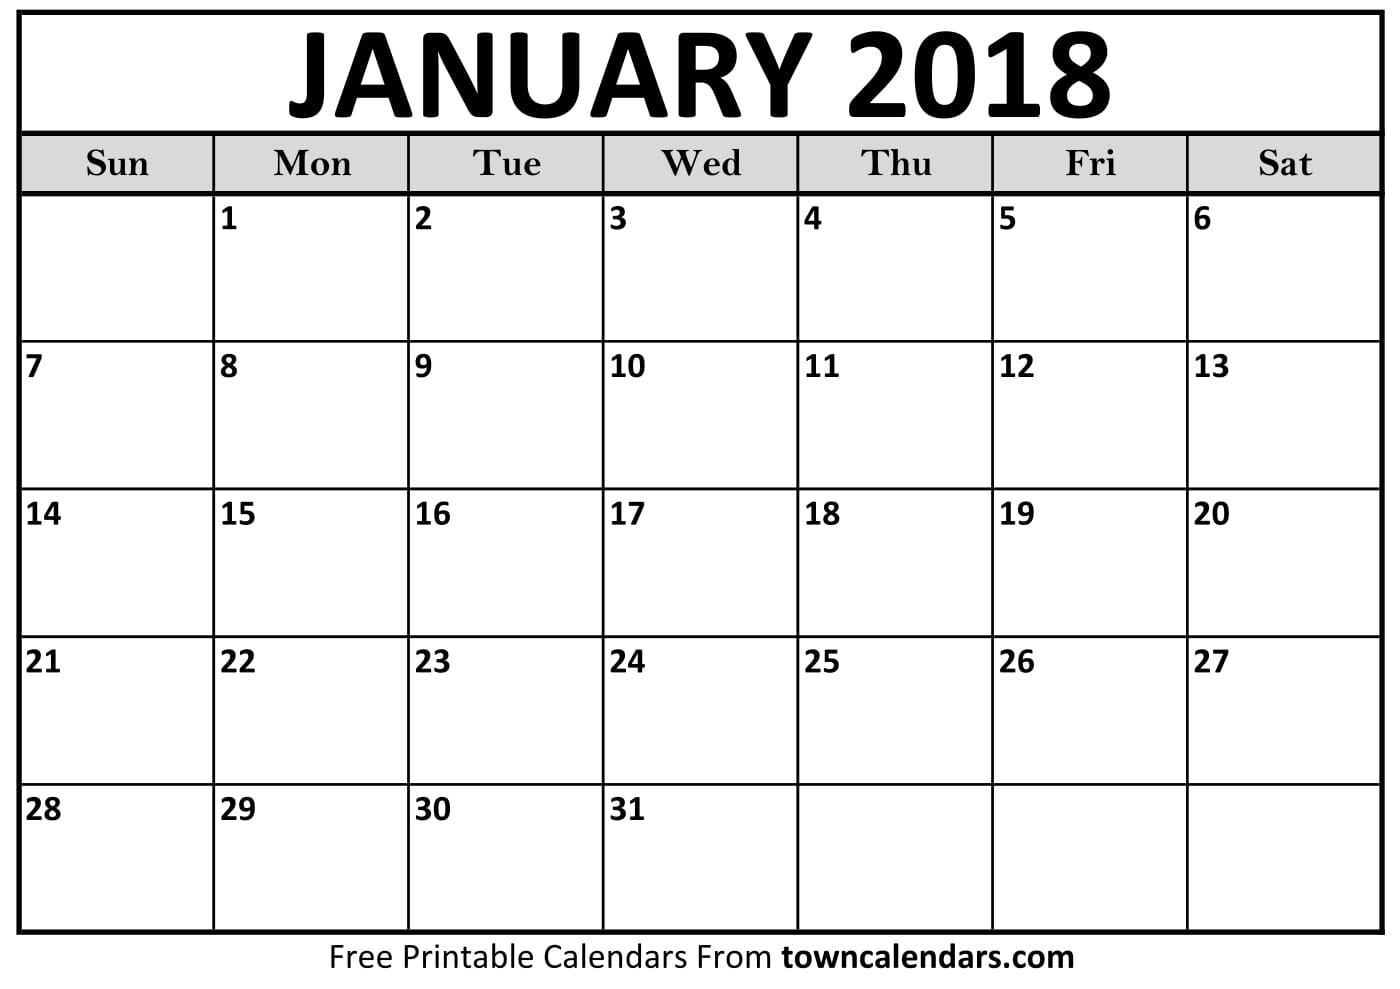 Blank Monthly Calendar January : January calendars kalendar